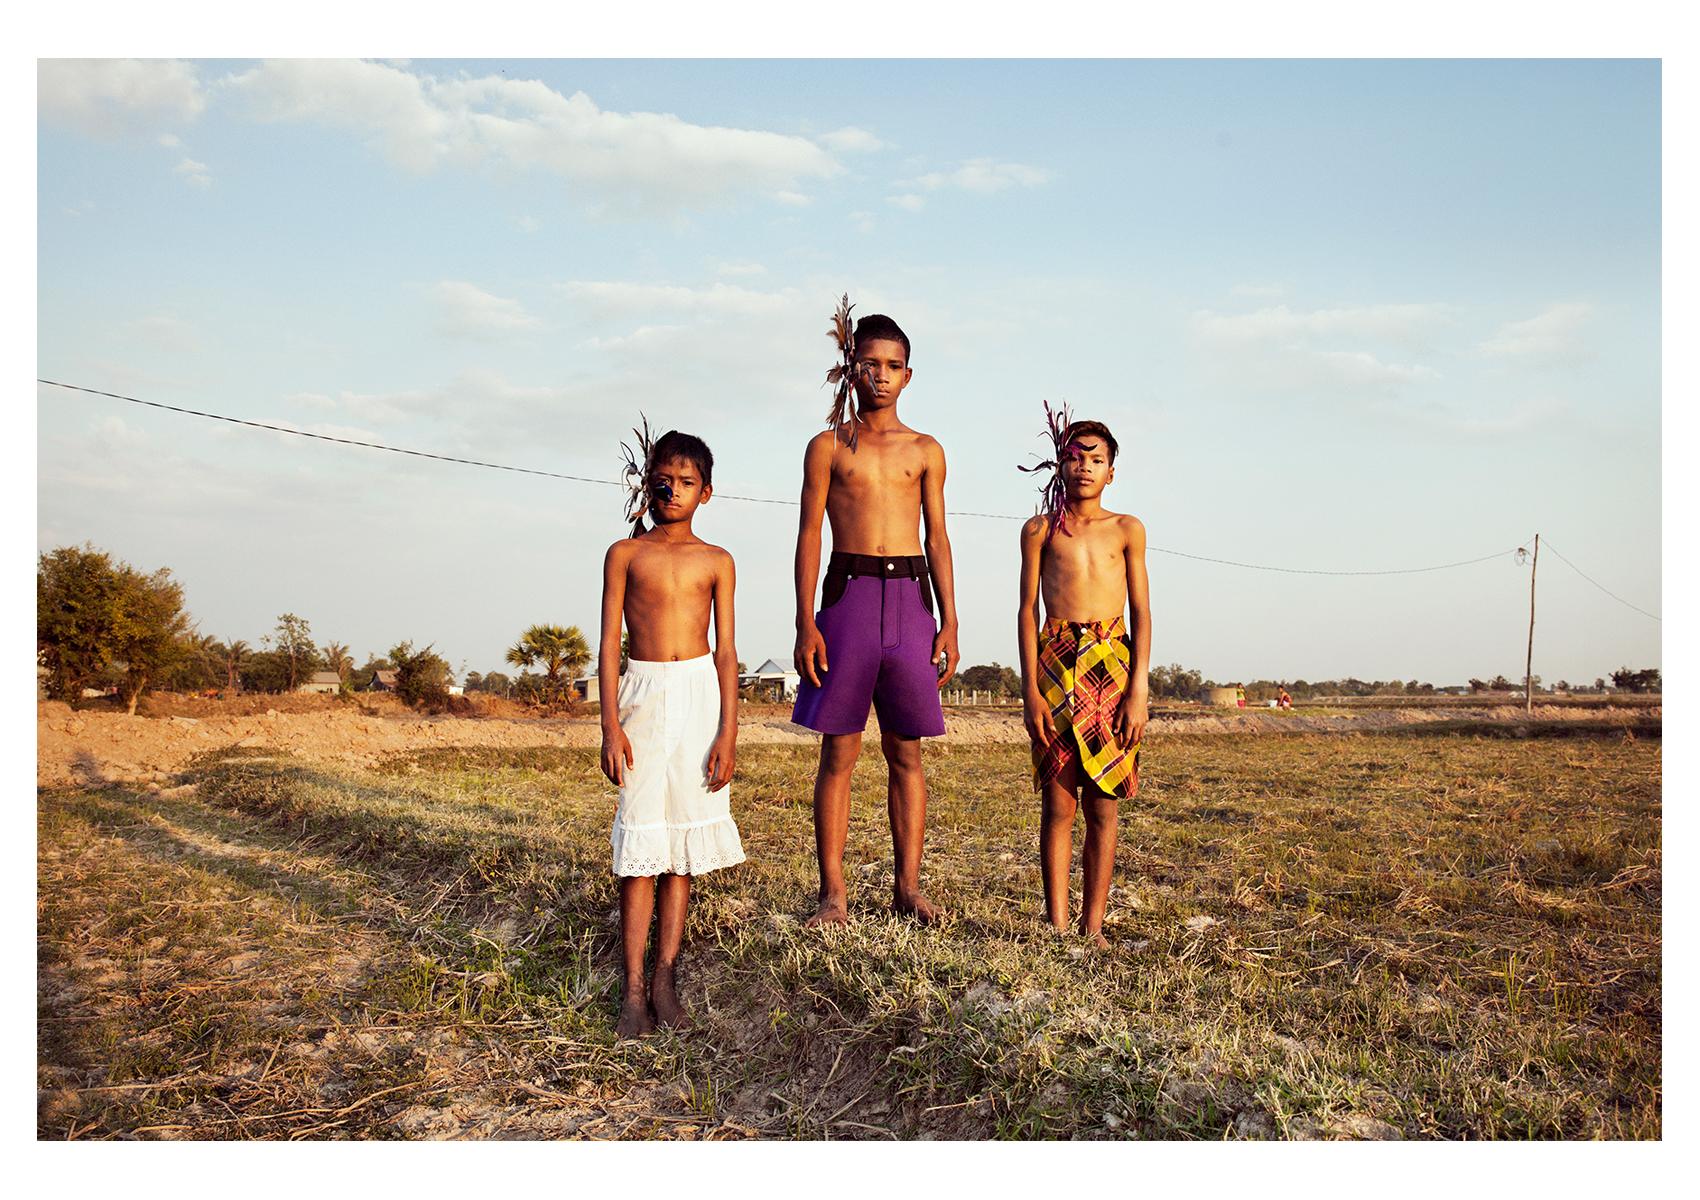 gypsy_cambodia_4.jpg